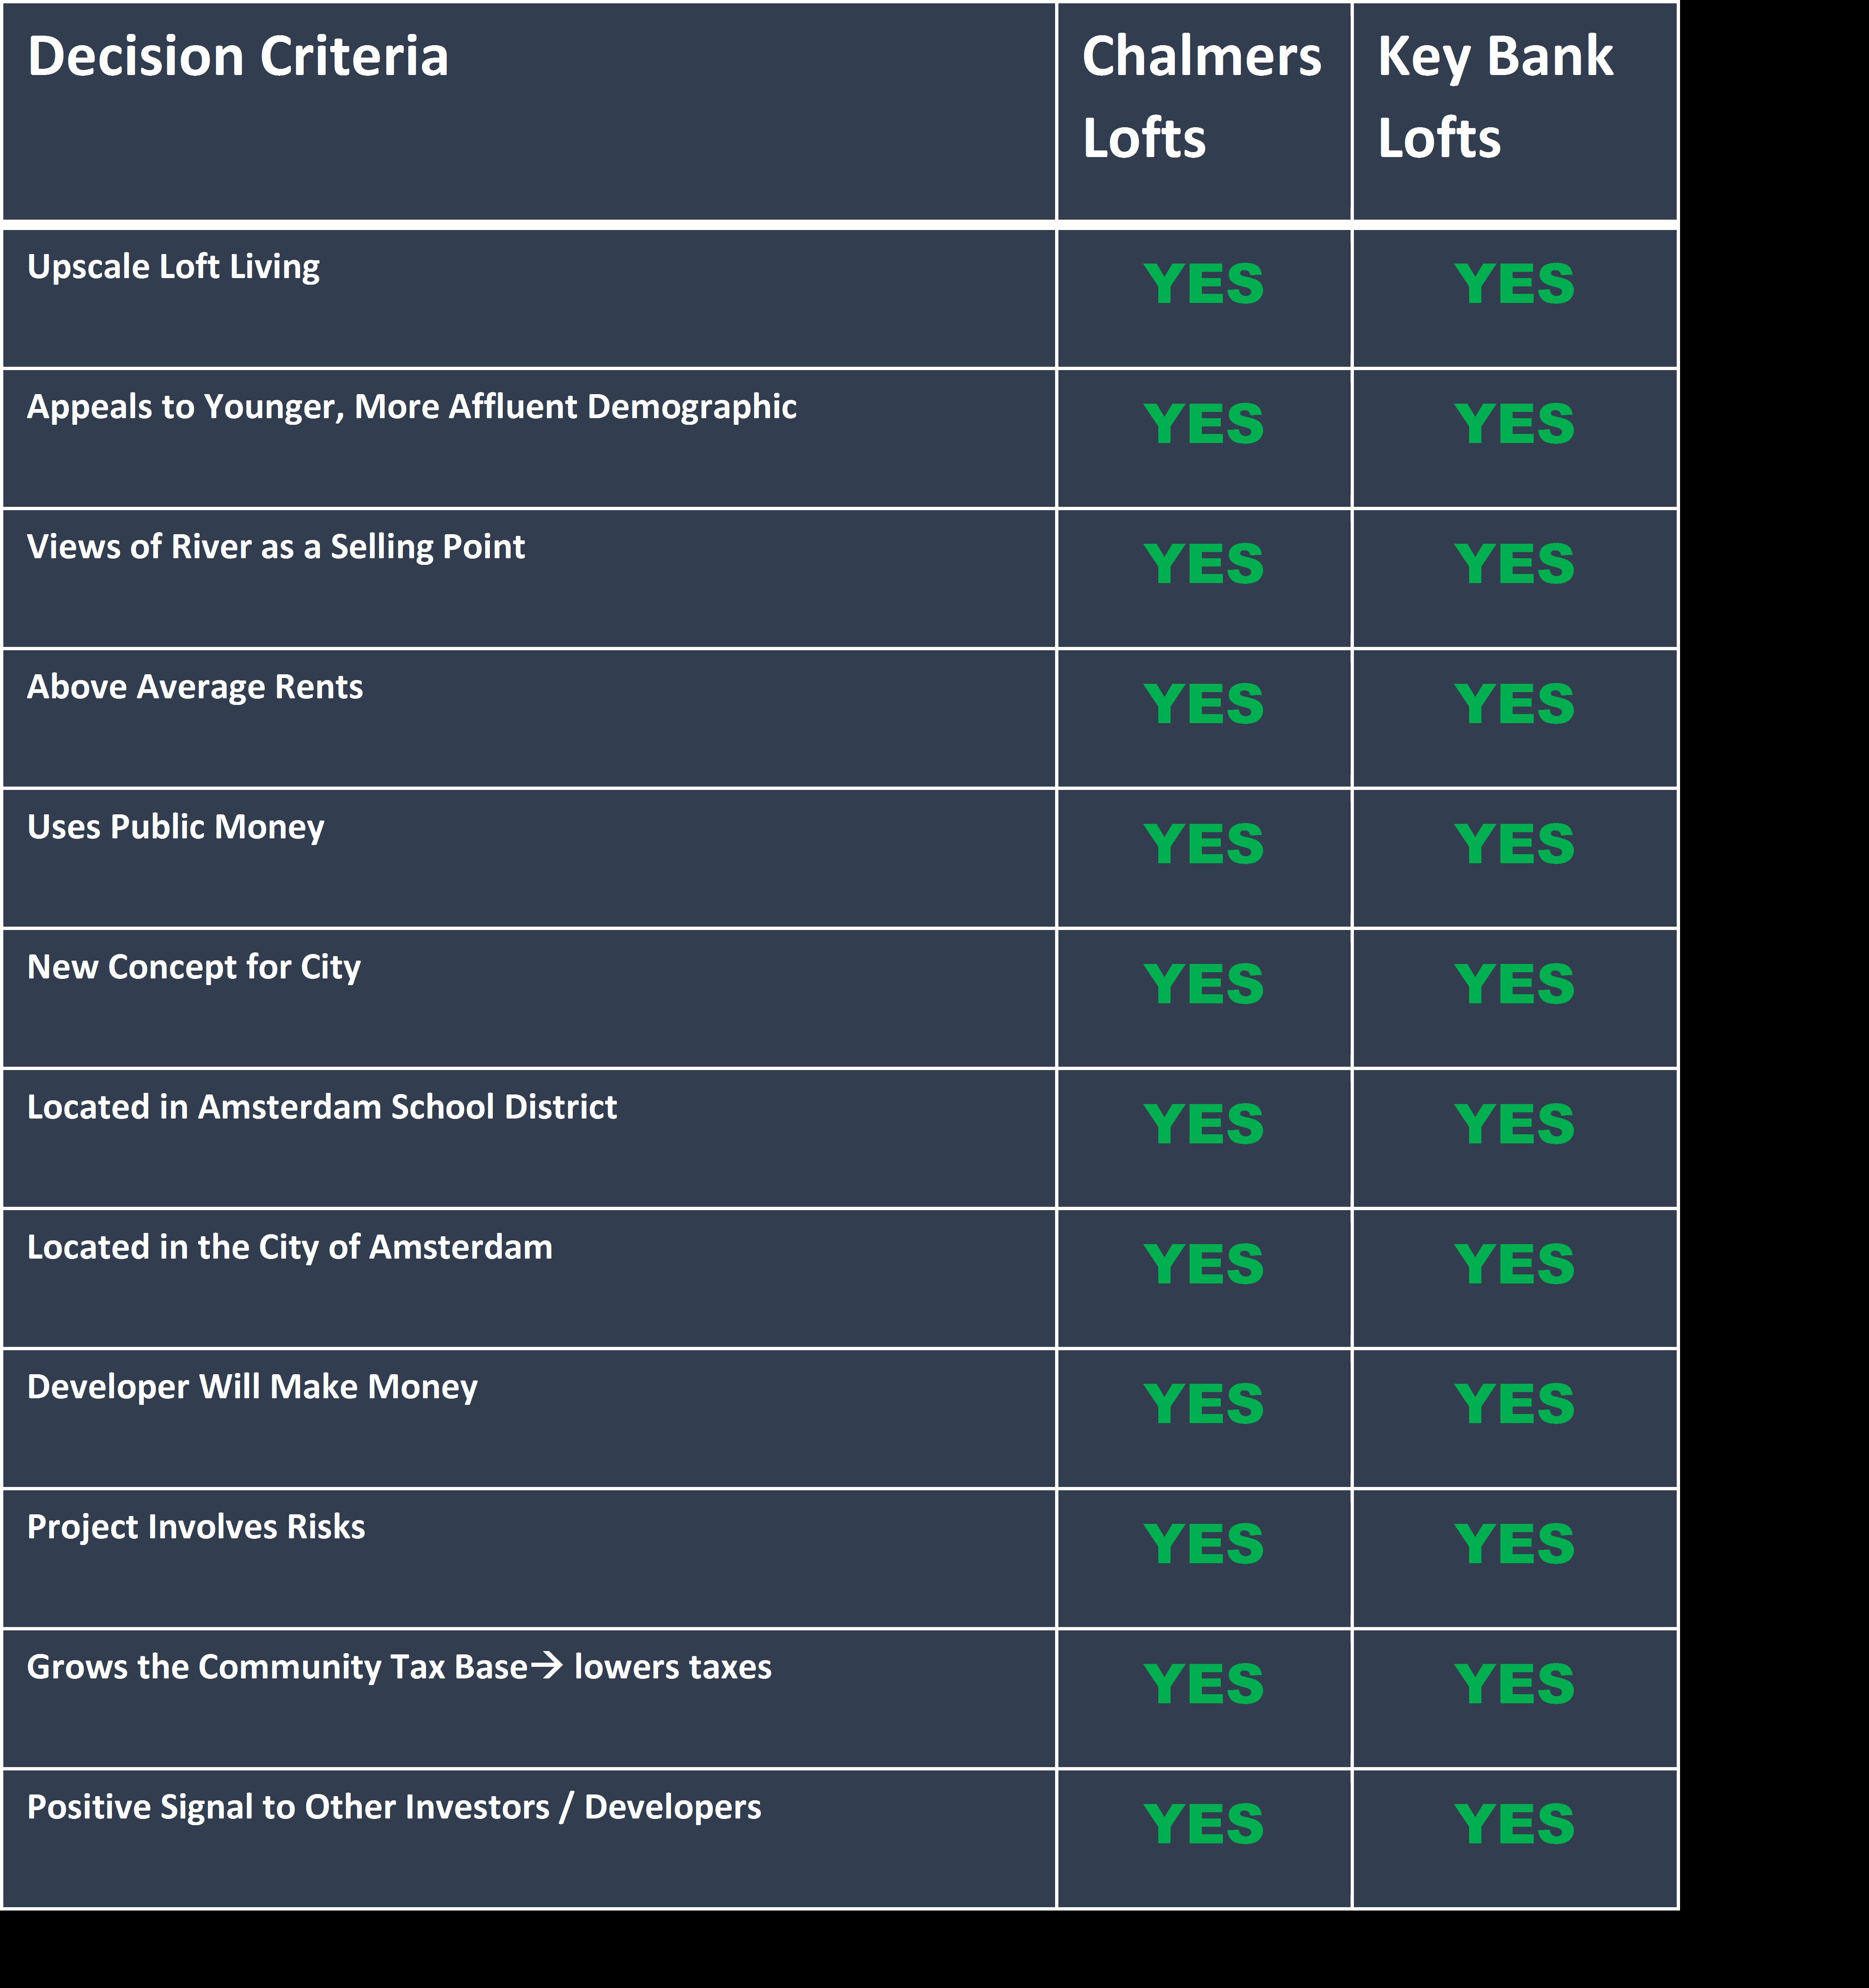 Chalmers versus Key Bank Development